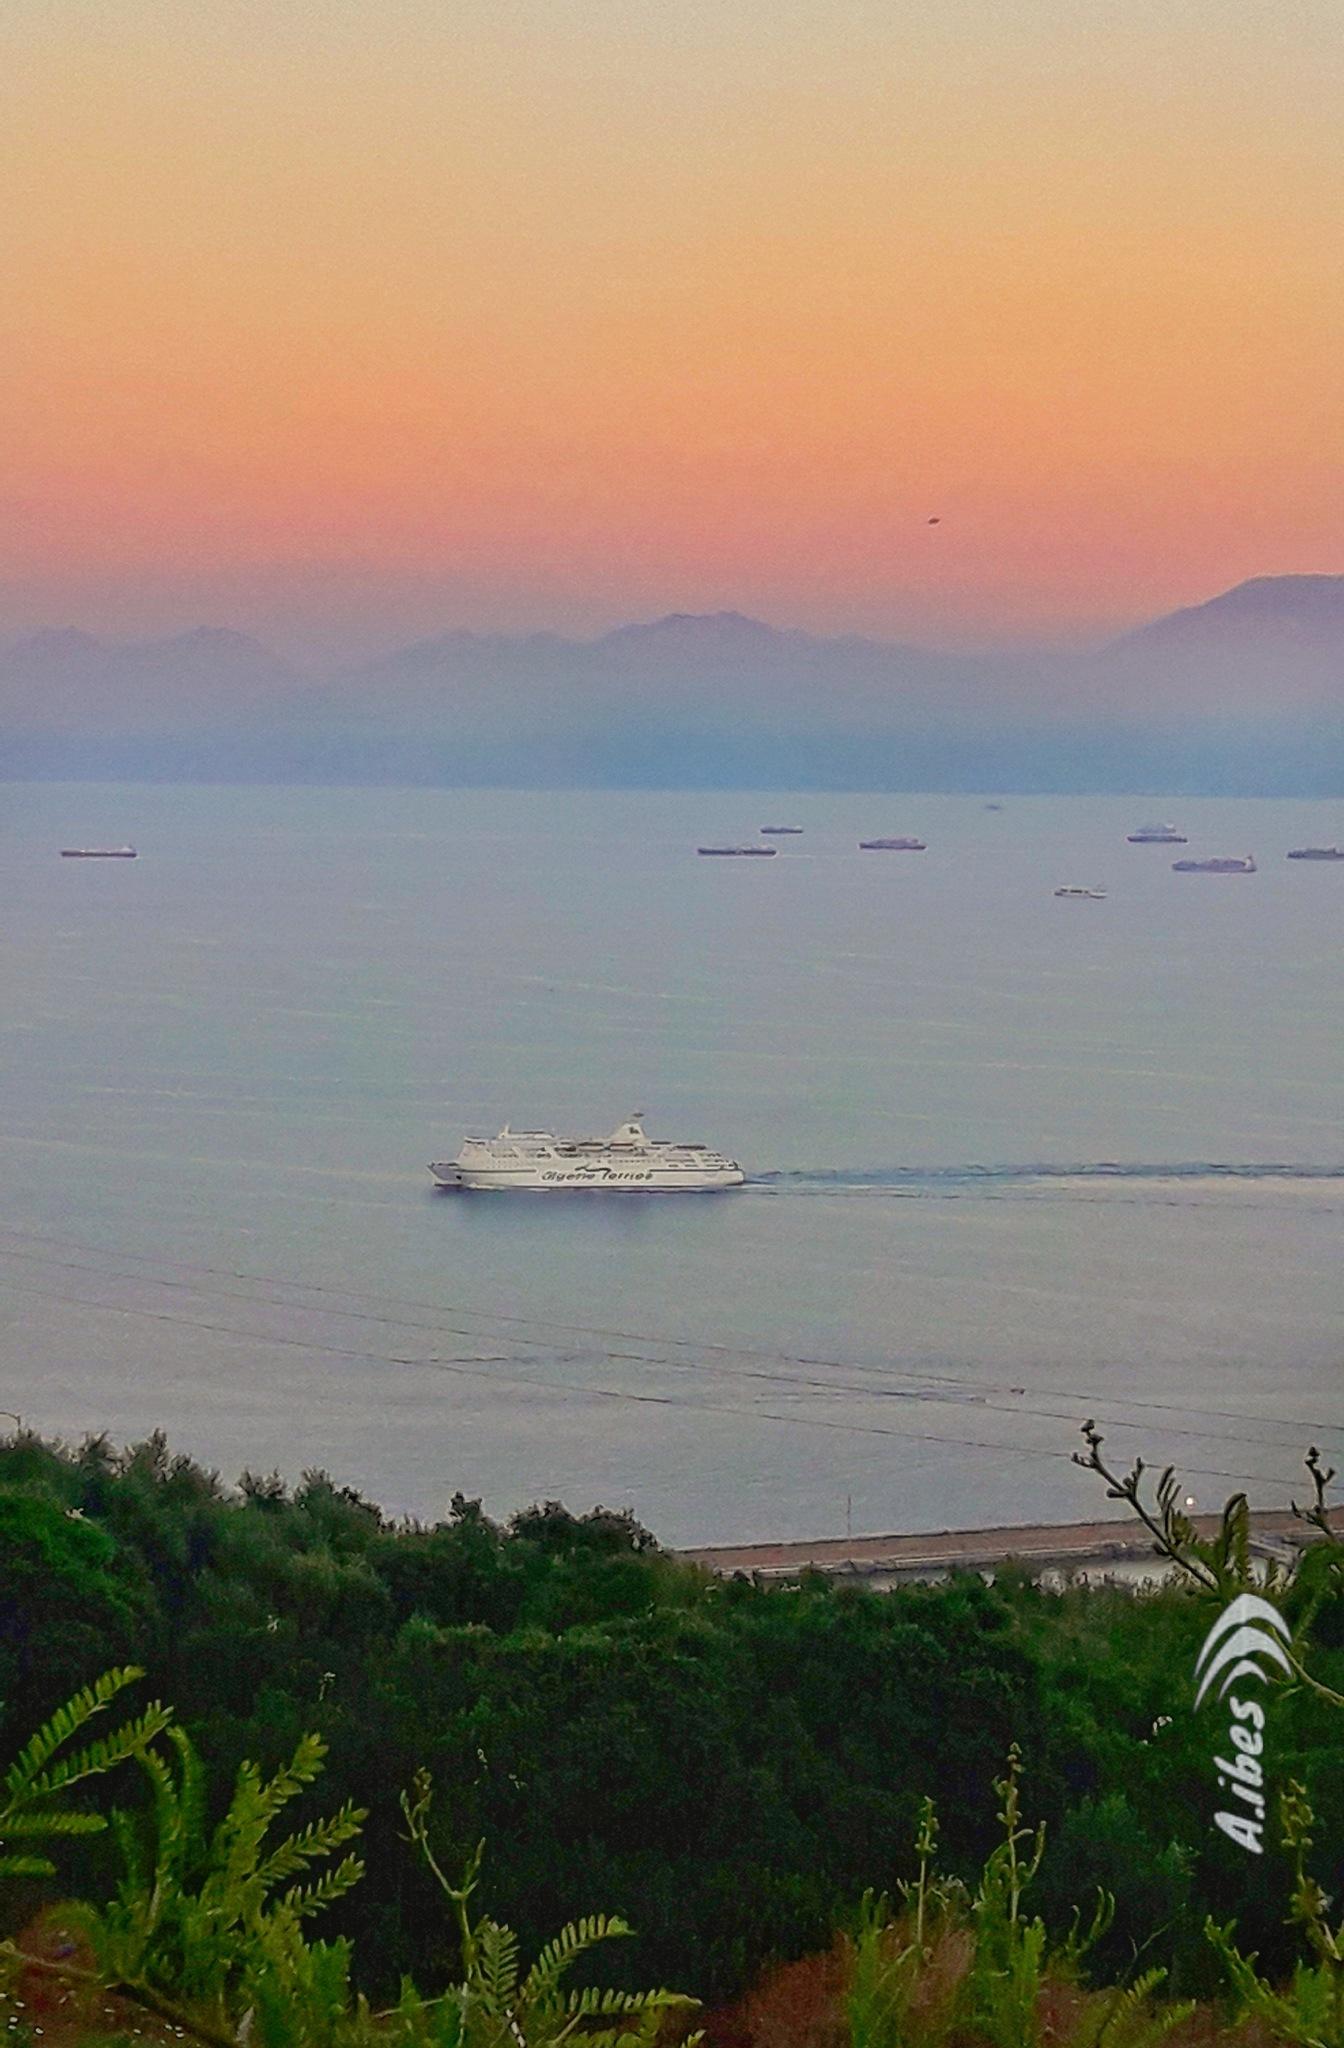 #sunset #bateau #méditerranée  by Ali Ibes